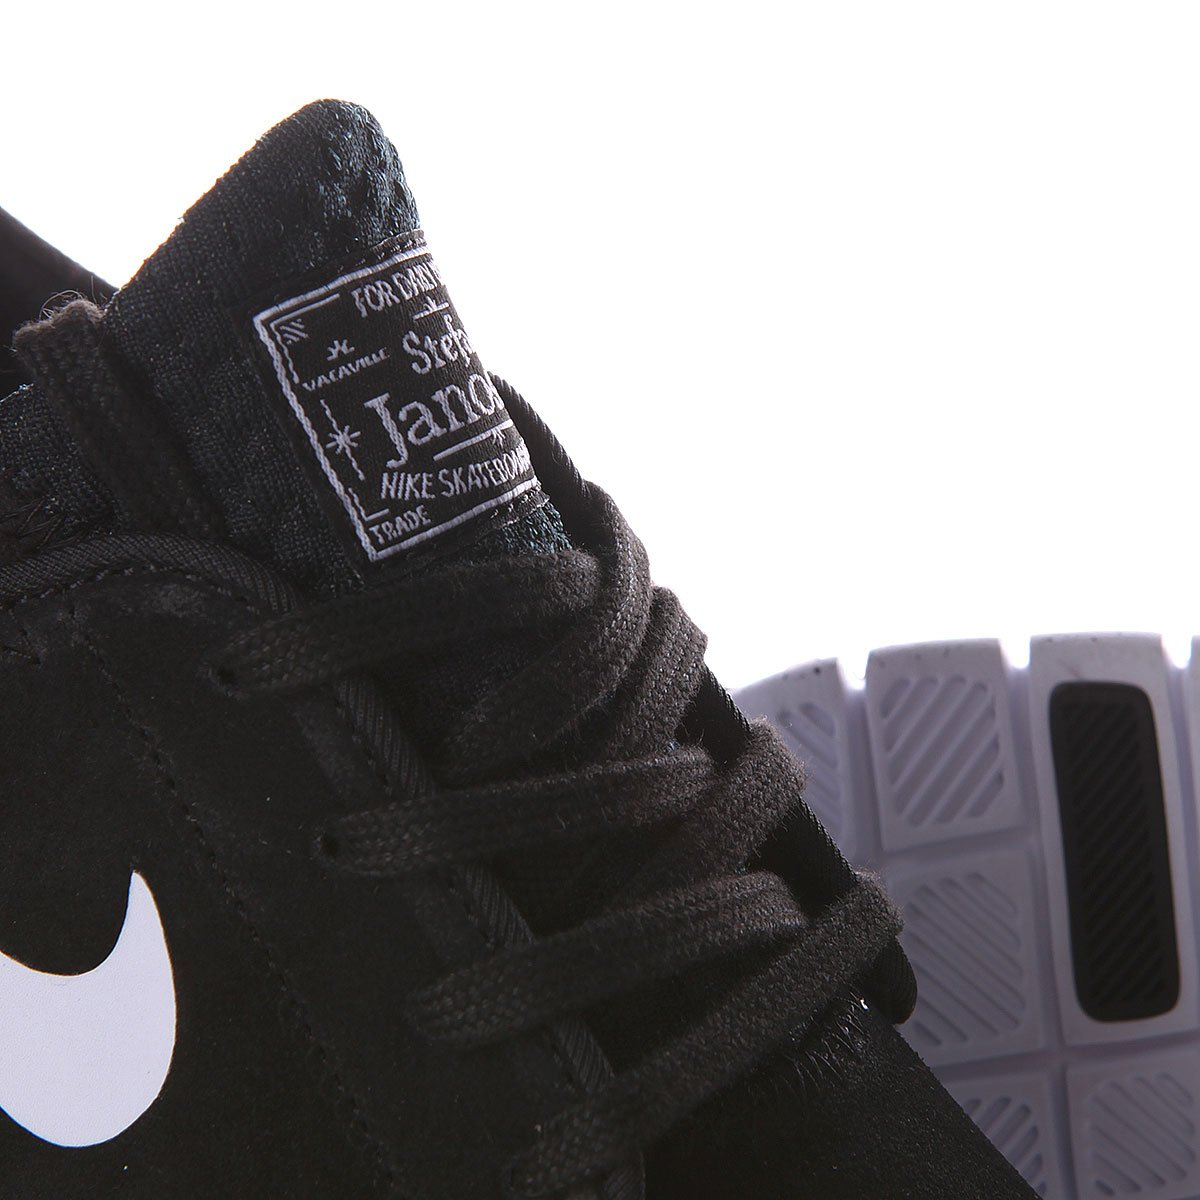 best website 98098 4d1e1 ... Кроссовки Nike Stefan Janoski Max L Black White